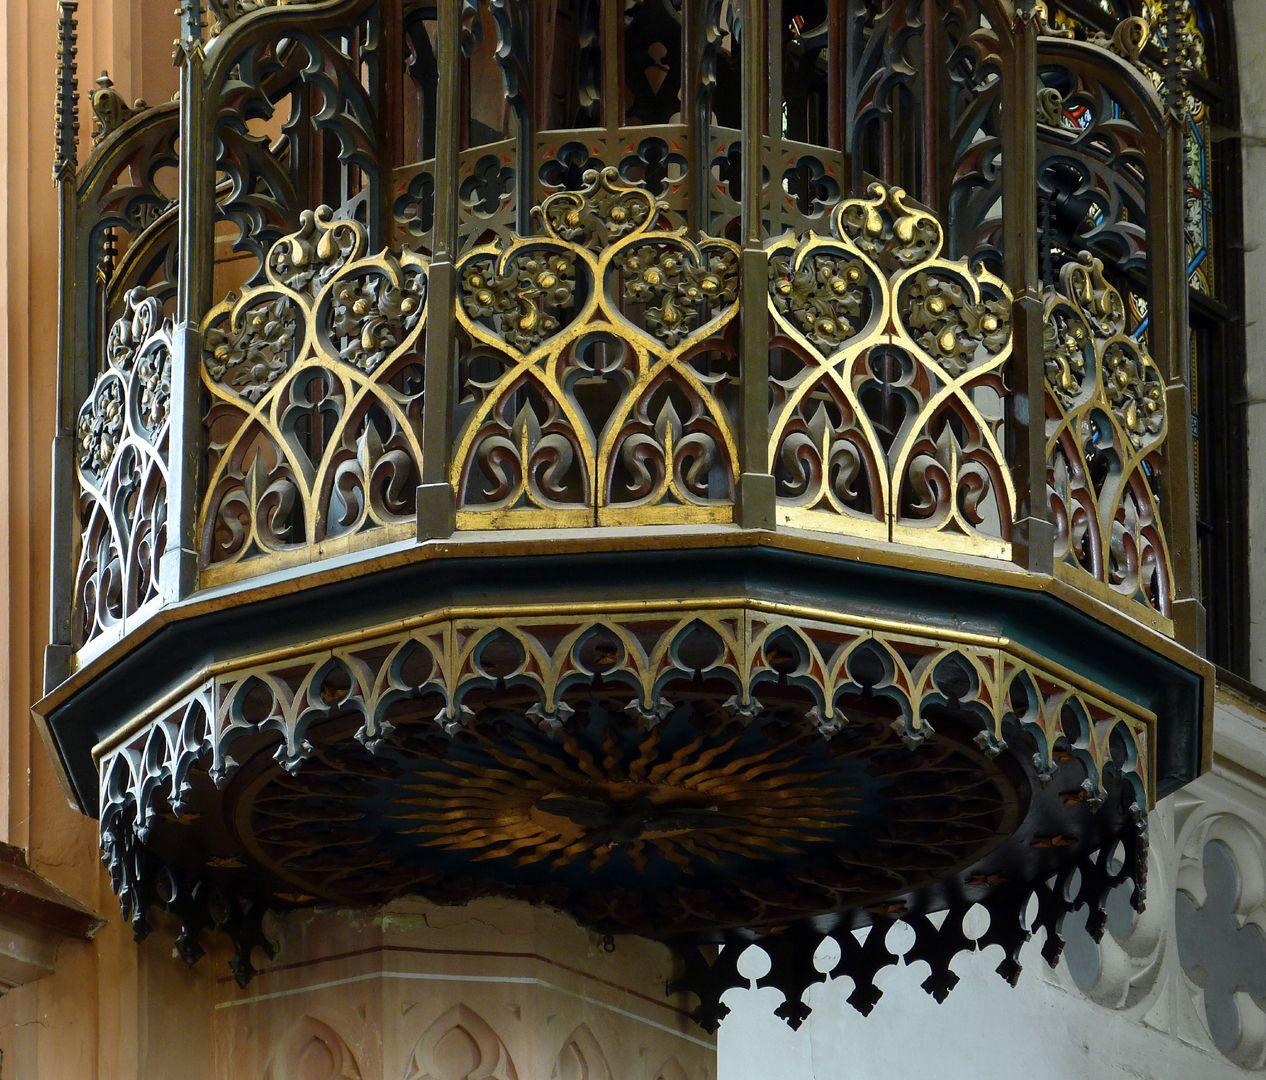 Parish Church St. Peter´s (Sonneberg) Pulpit ceiling, detail. Design Heideloff, realization Paul Gottlieb Hartung